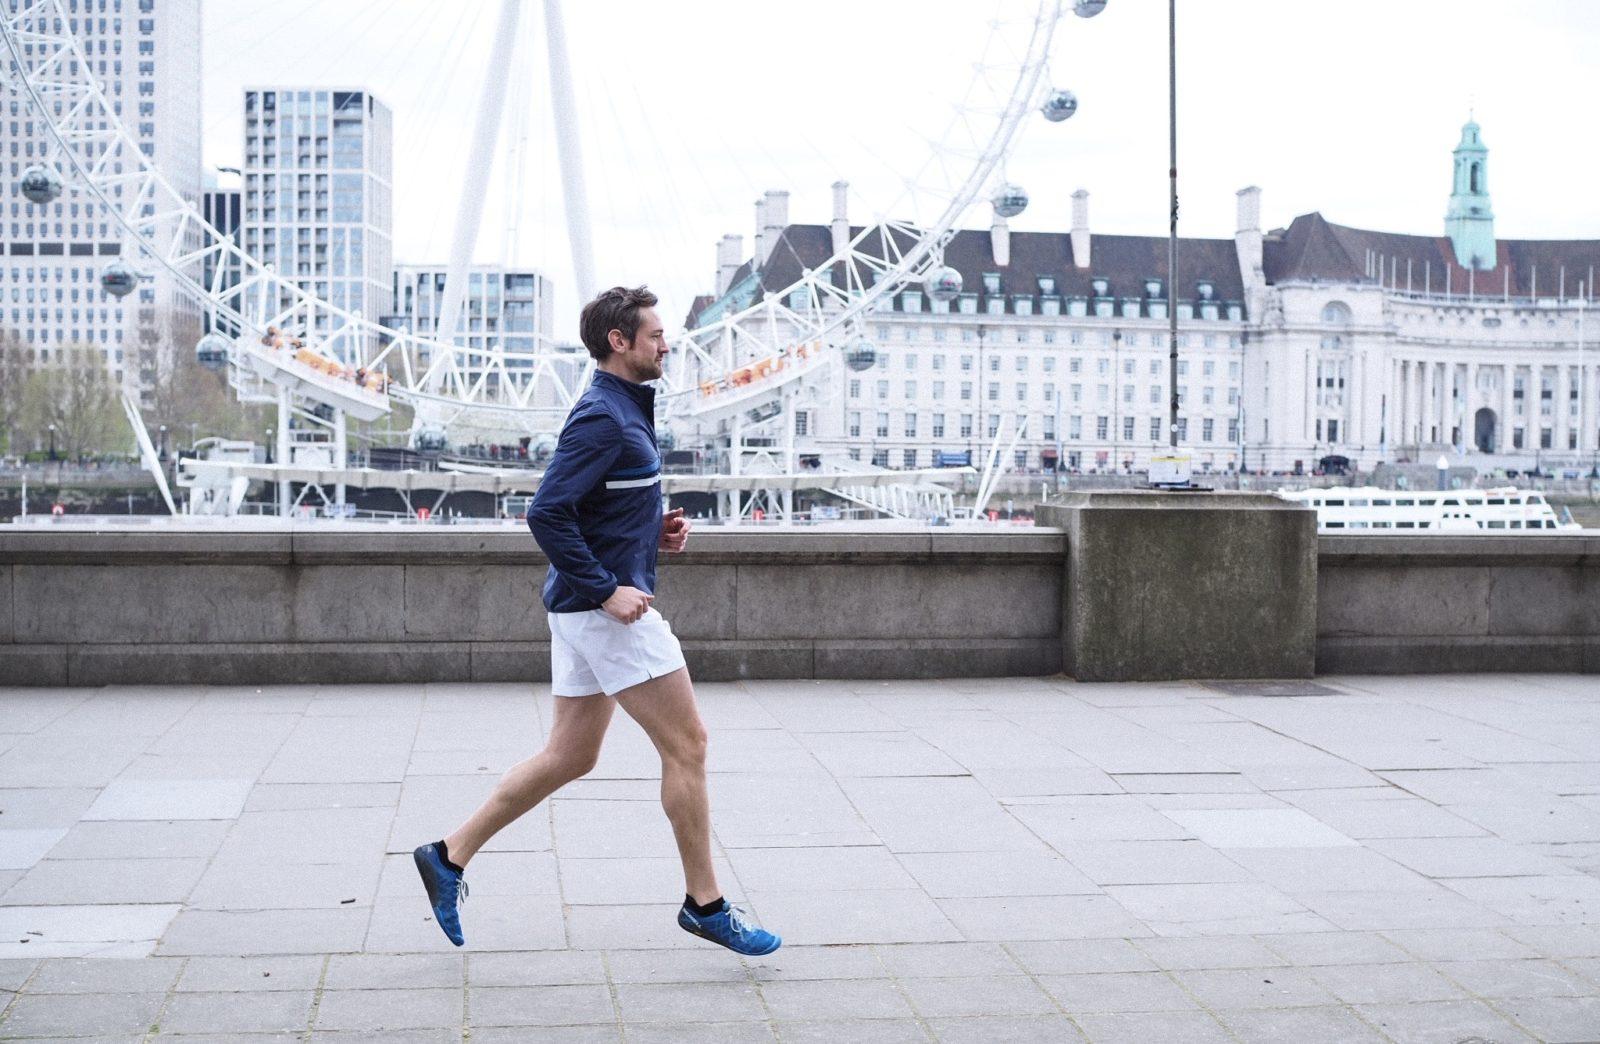 man running past london eye marathon